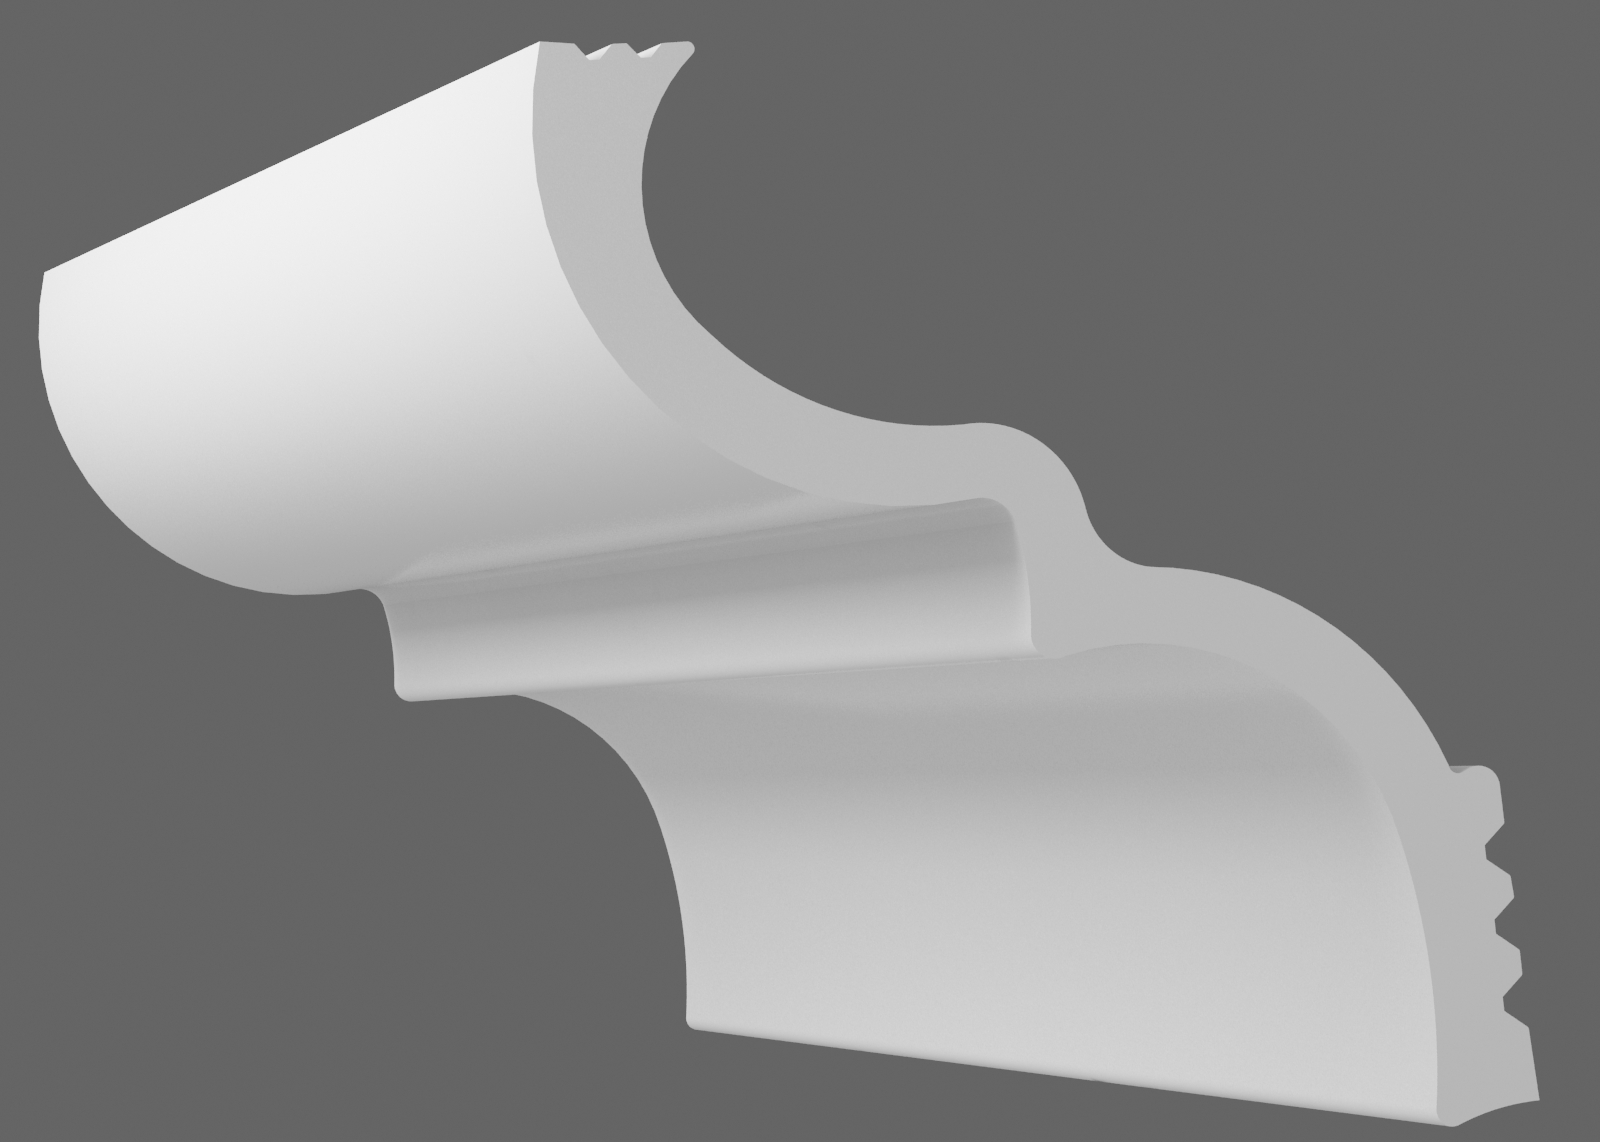 Потолочный плинтус S-100 (Размер:60х80мм)